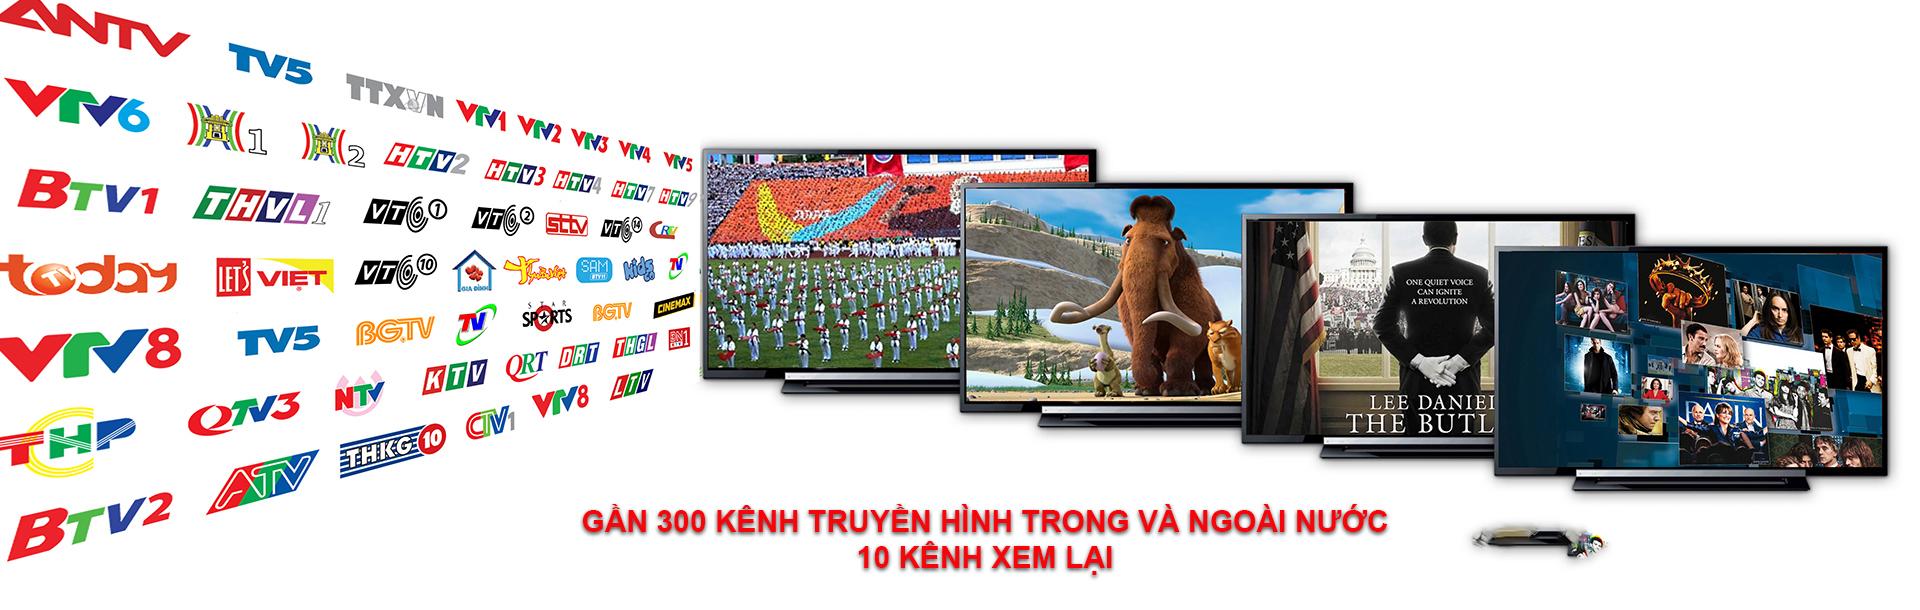 xem-truyen-hinh-tren-android-tv-box